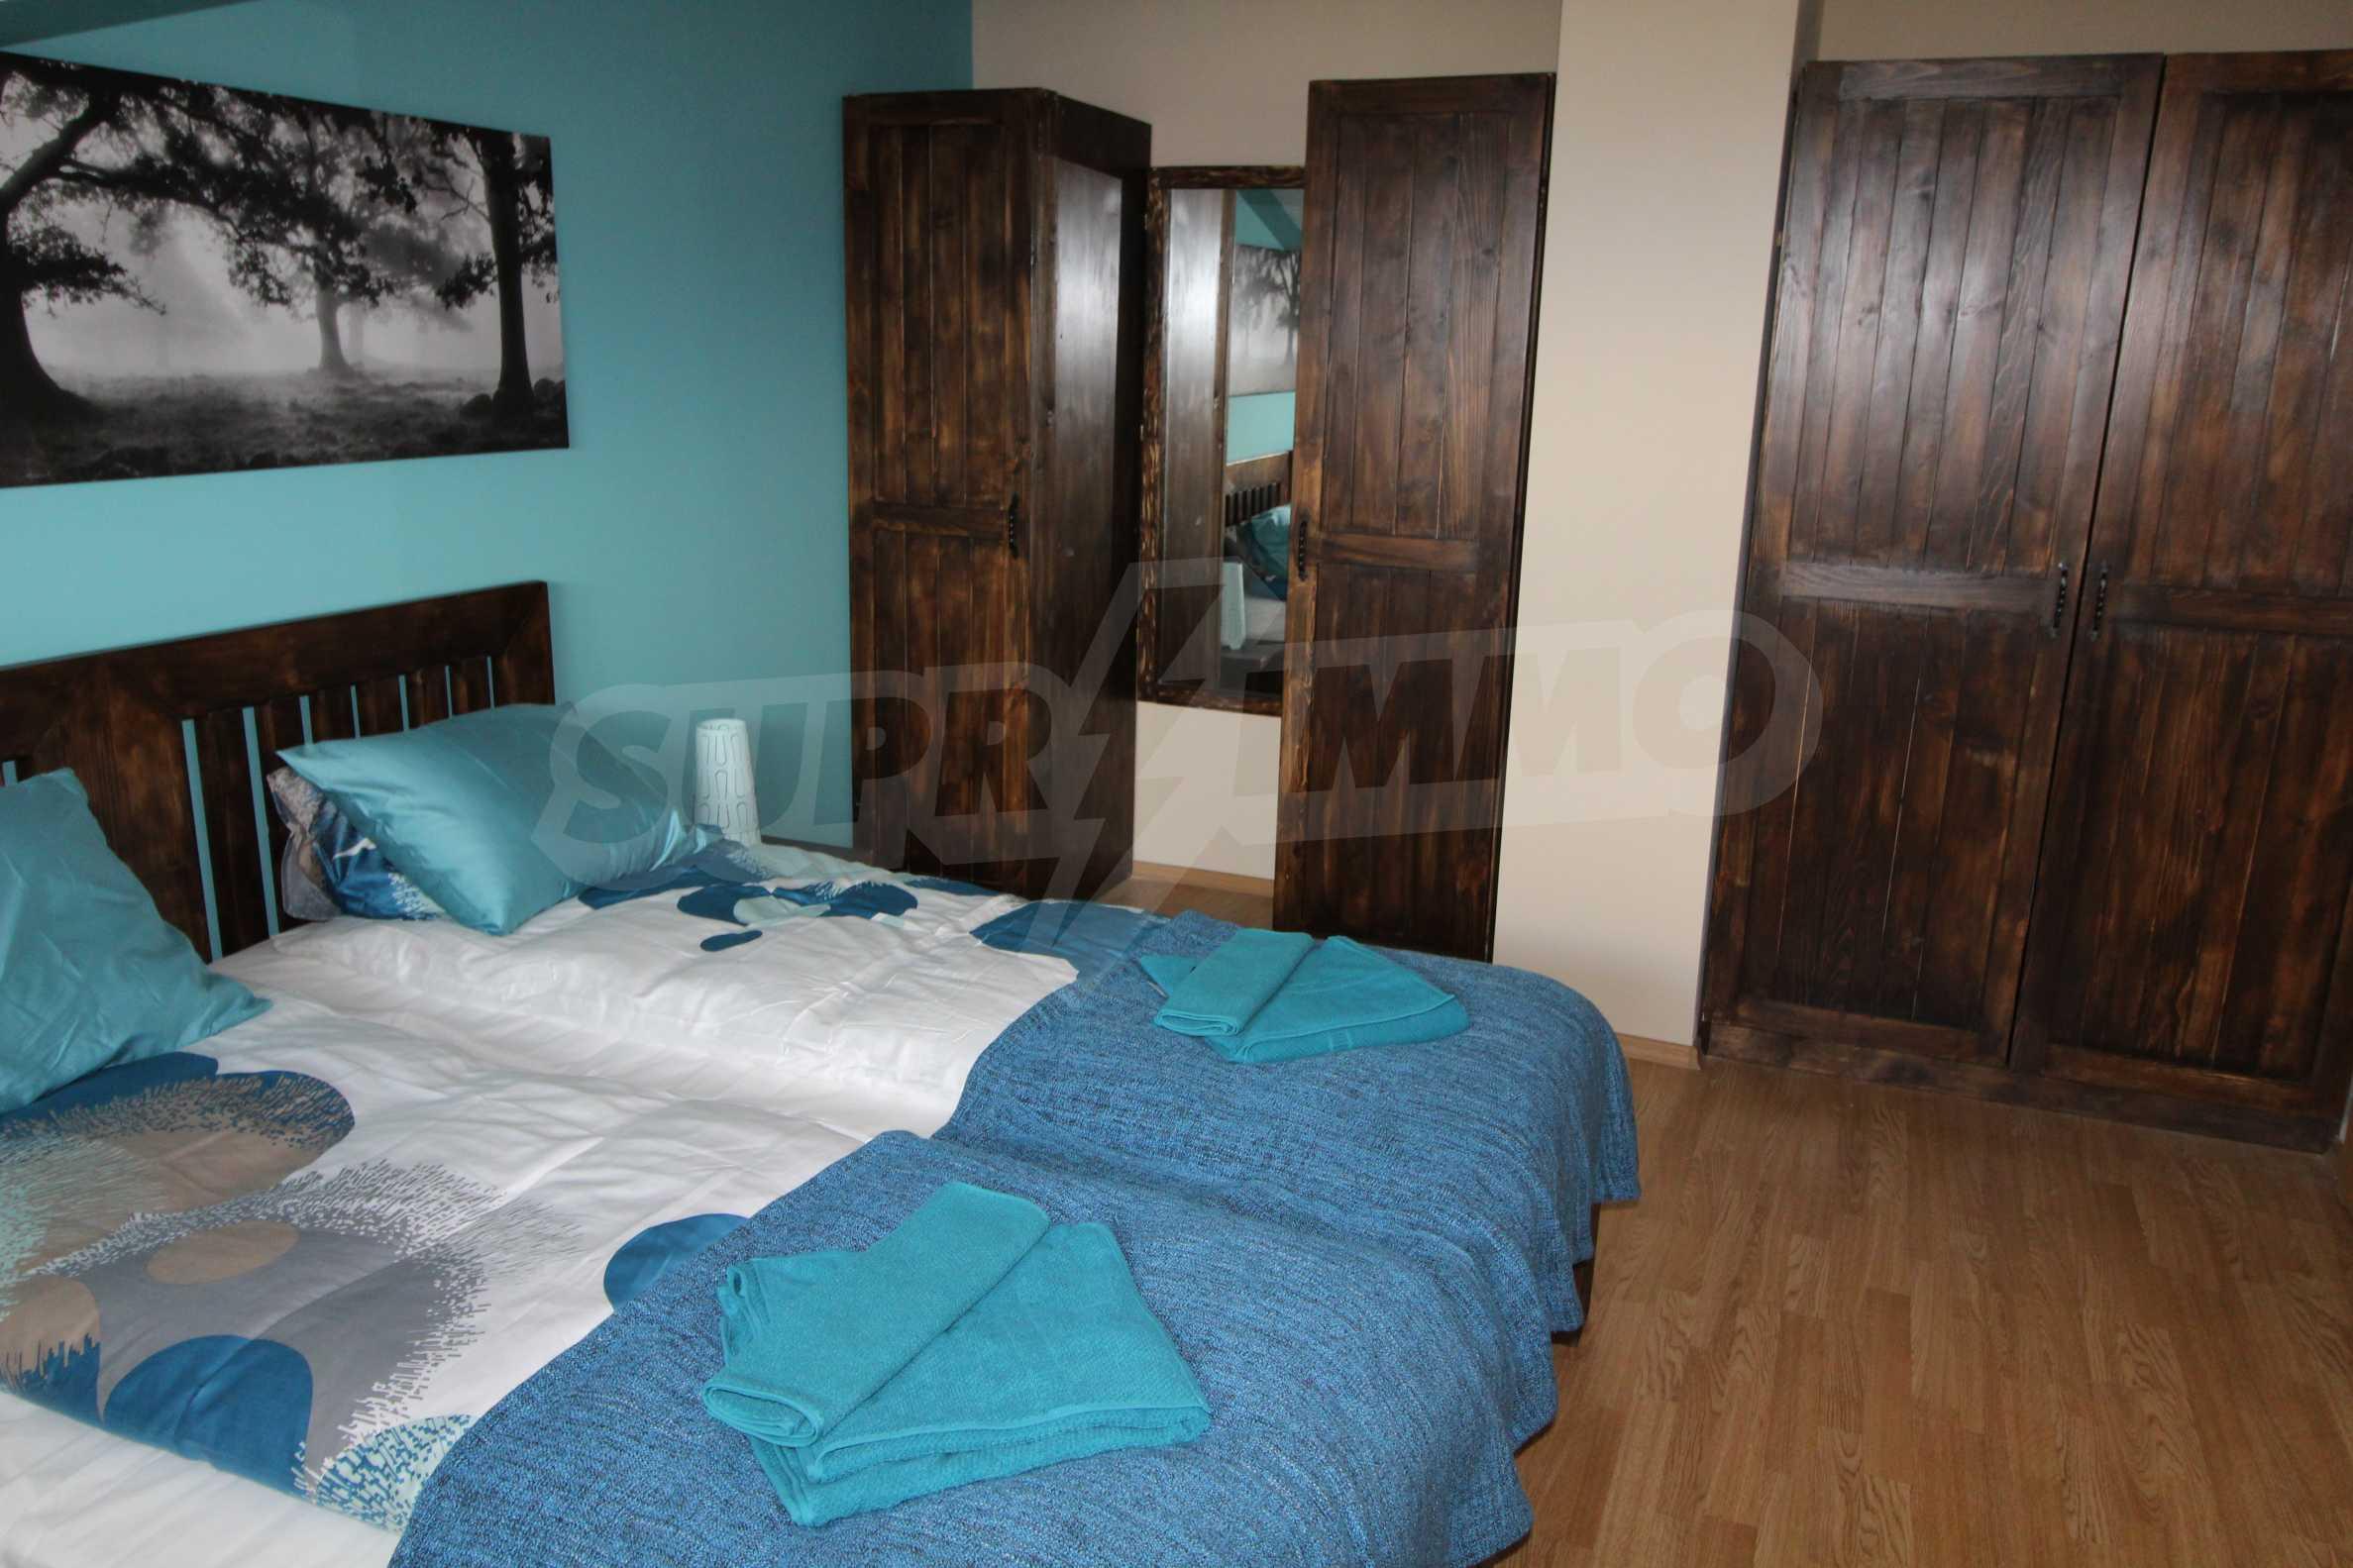 Стилен апартамент в близост до ски курорта Банско 16